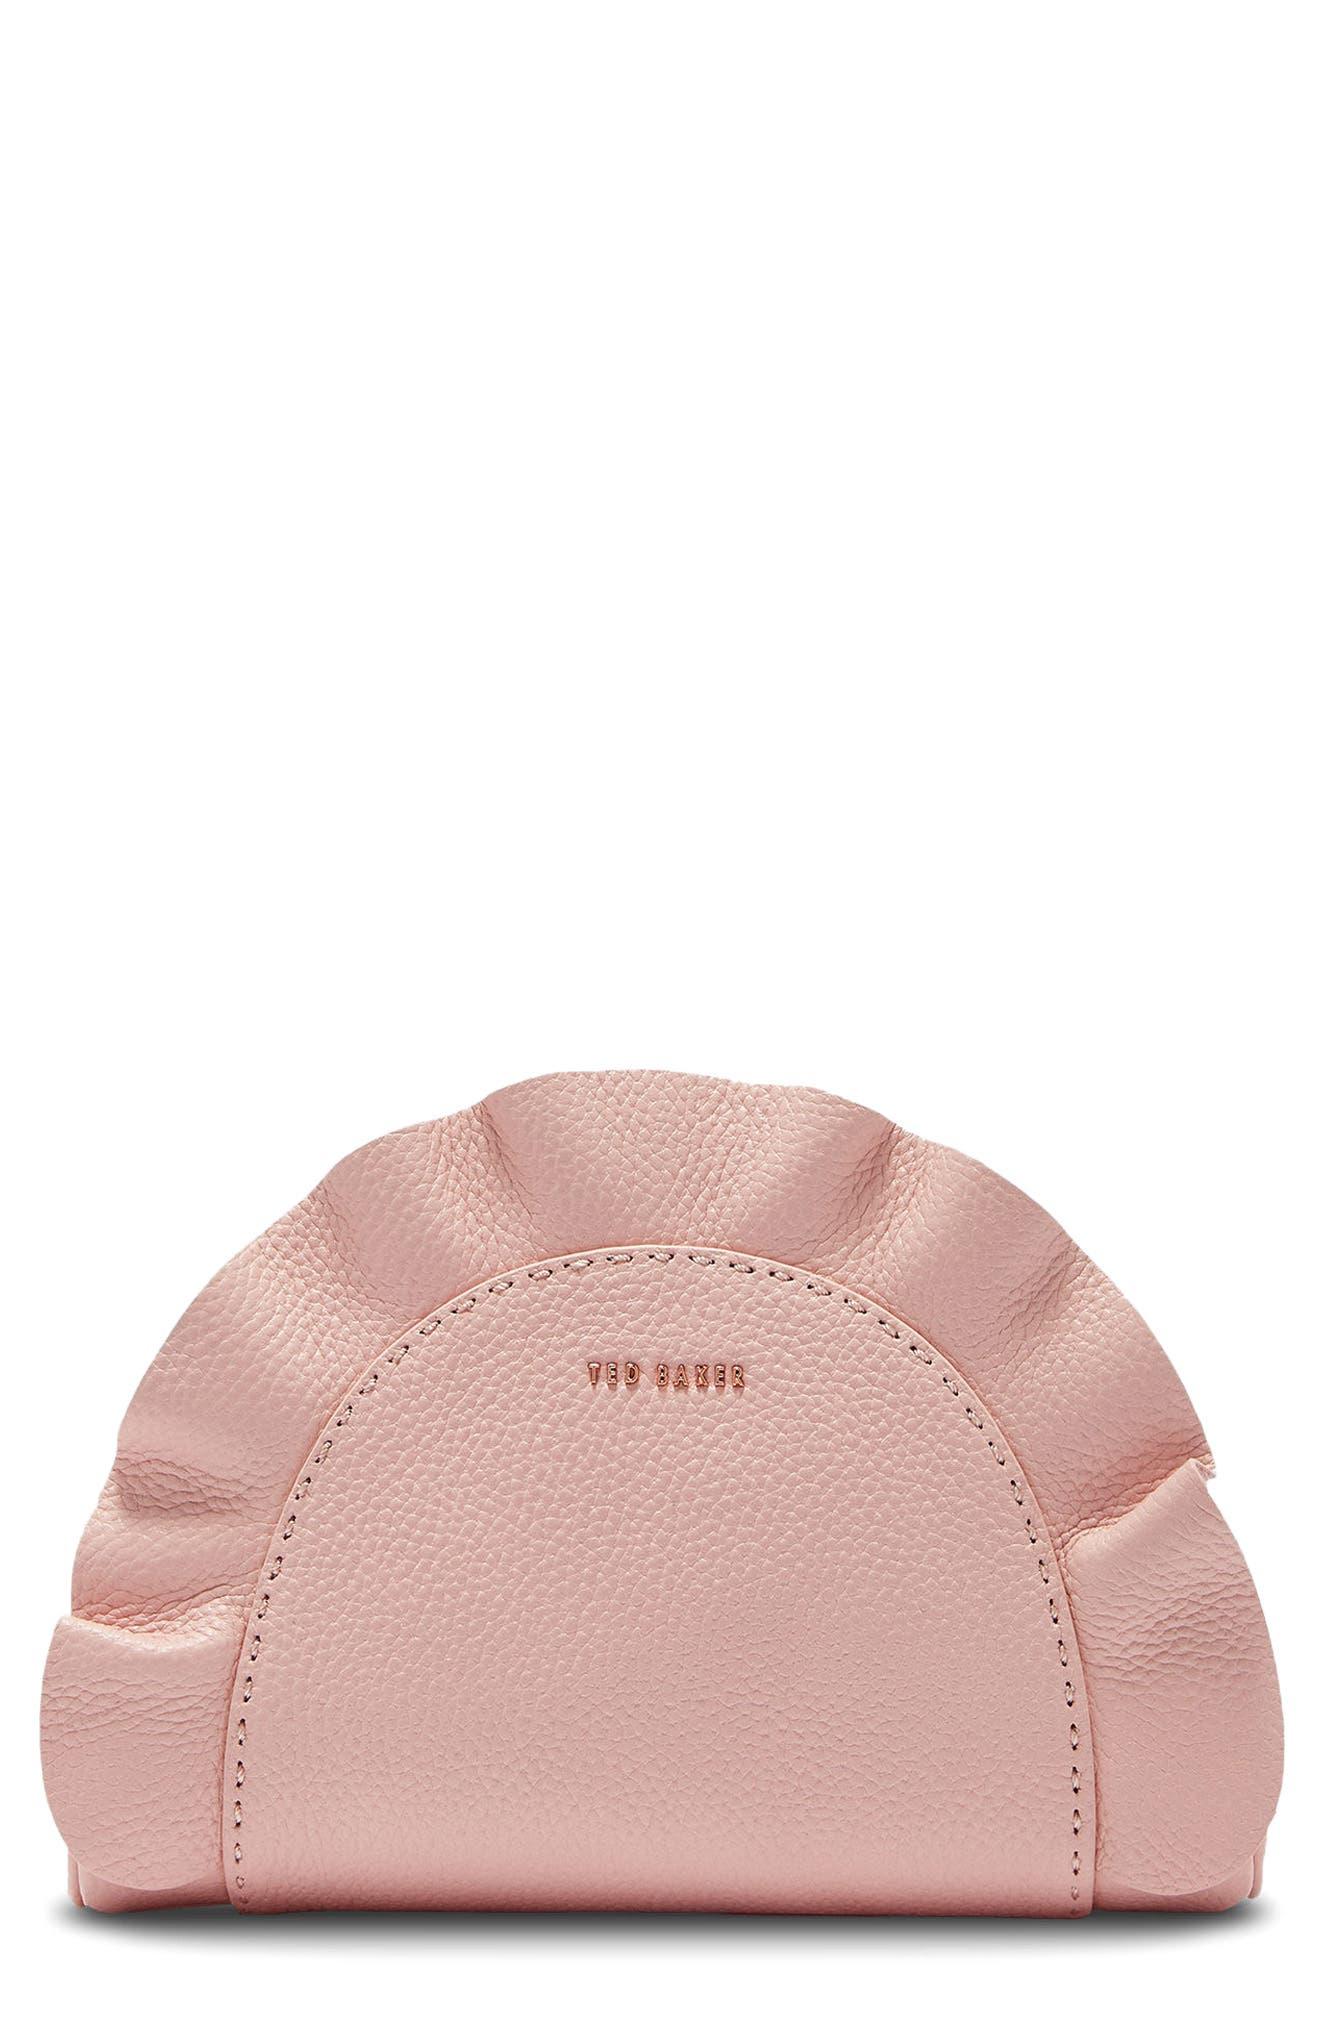 Ruffle Half Moon Leather Crossbody Bag,                         Main,                         color, Light Pink